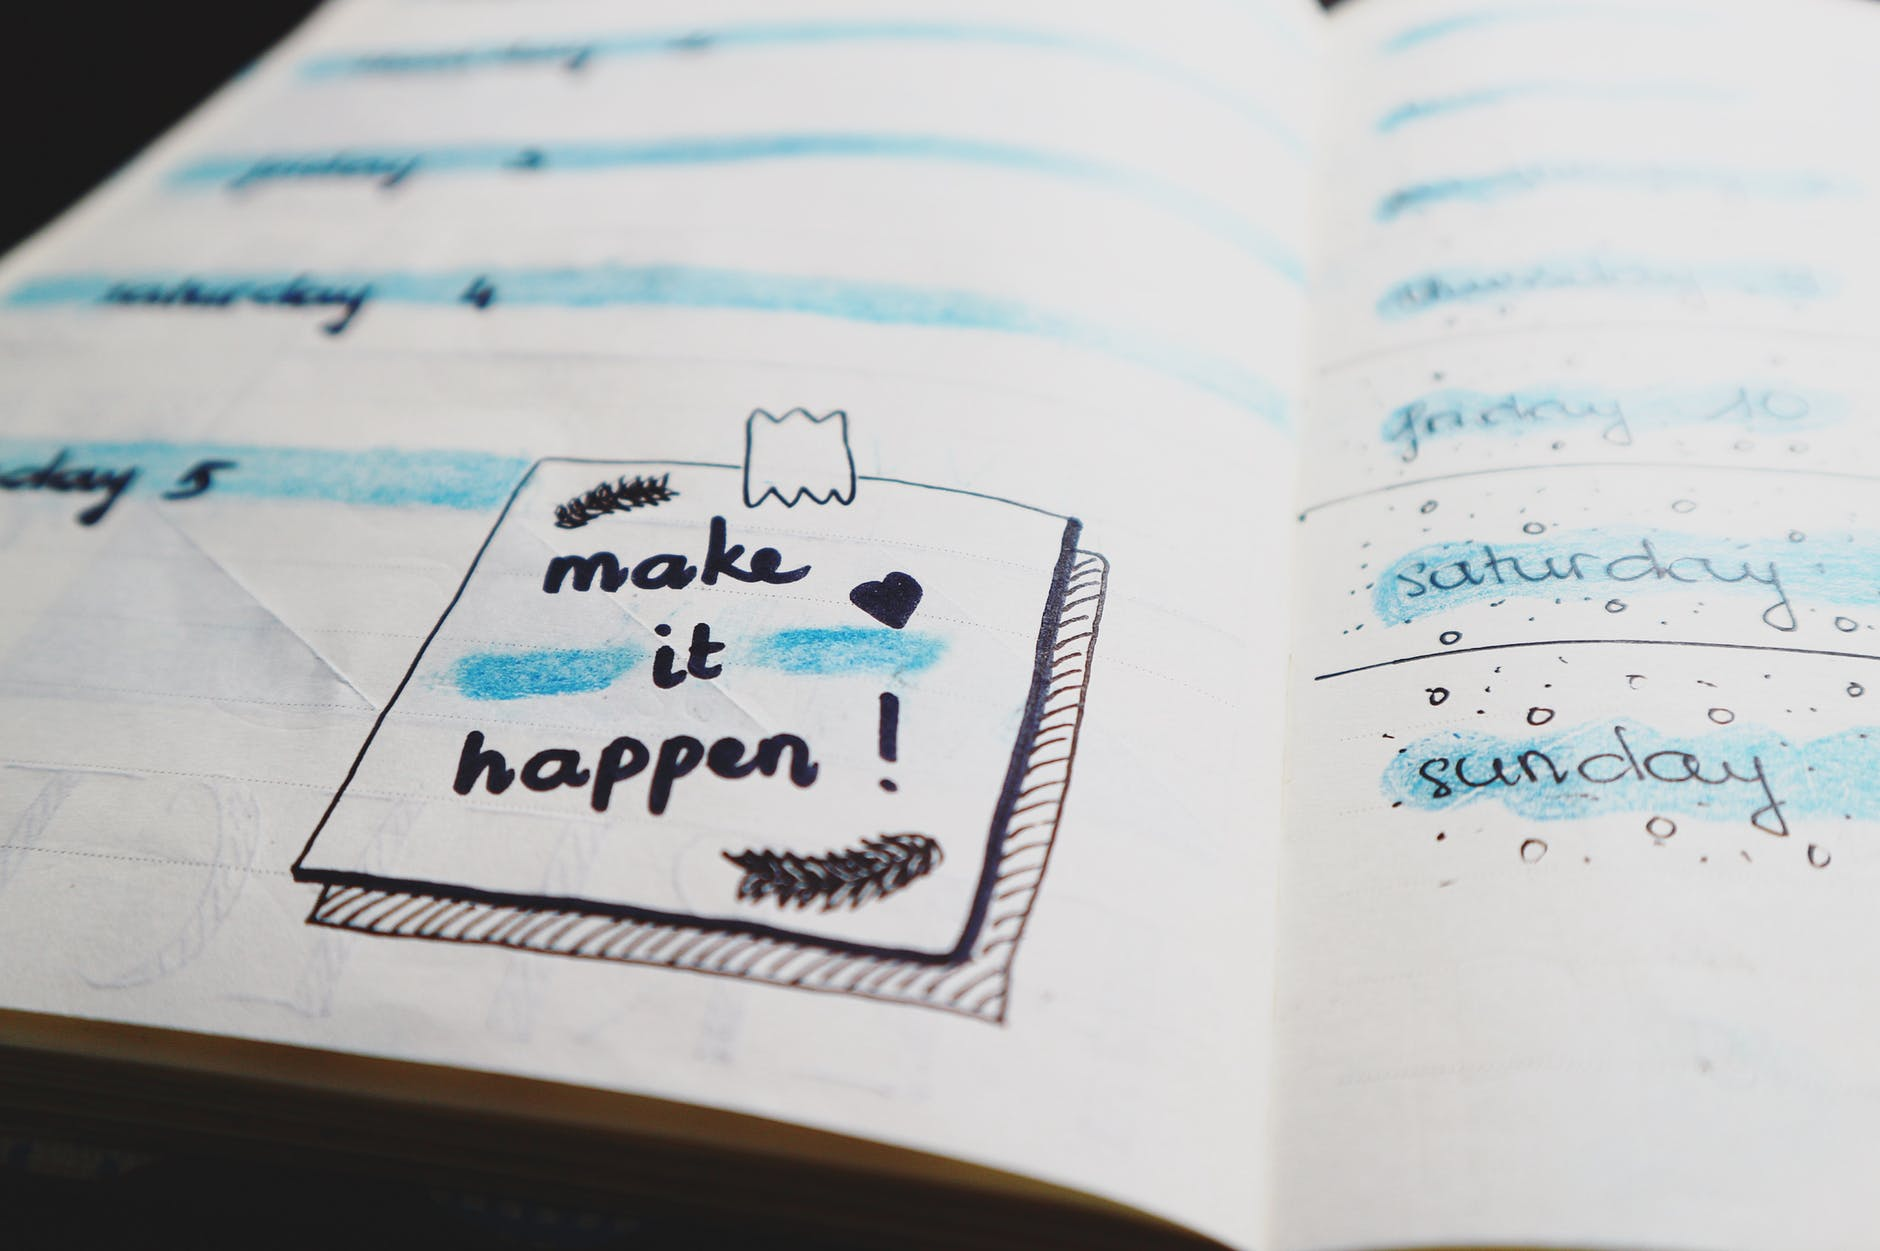 6 Secrets To Achieving Your Goals